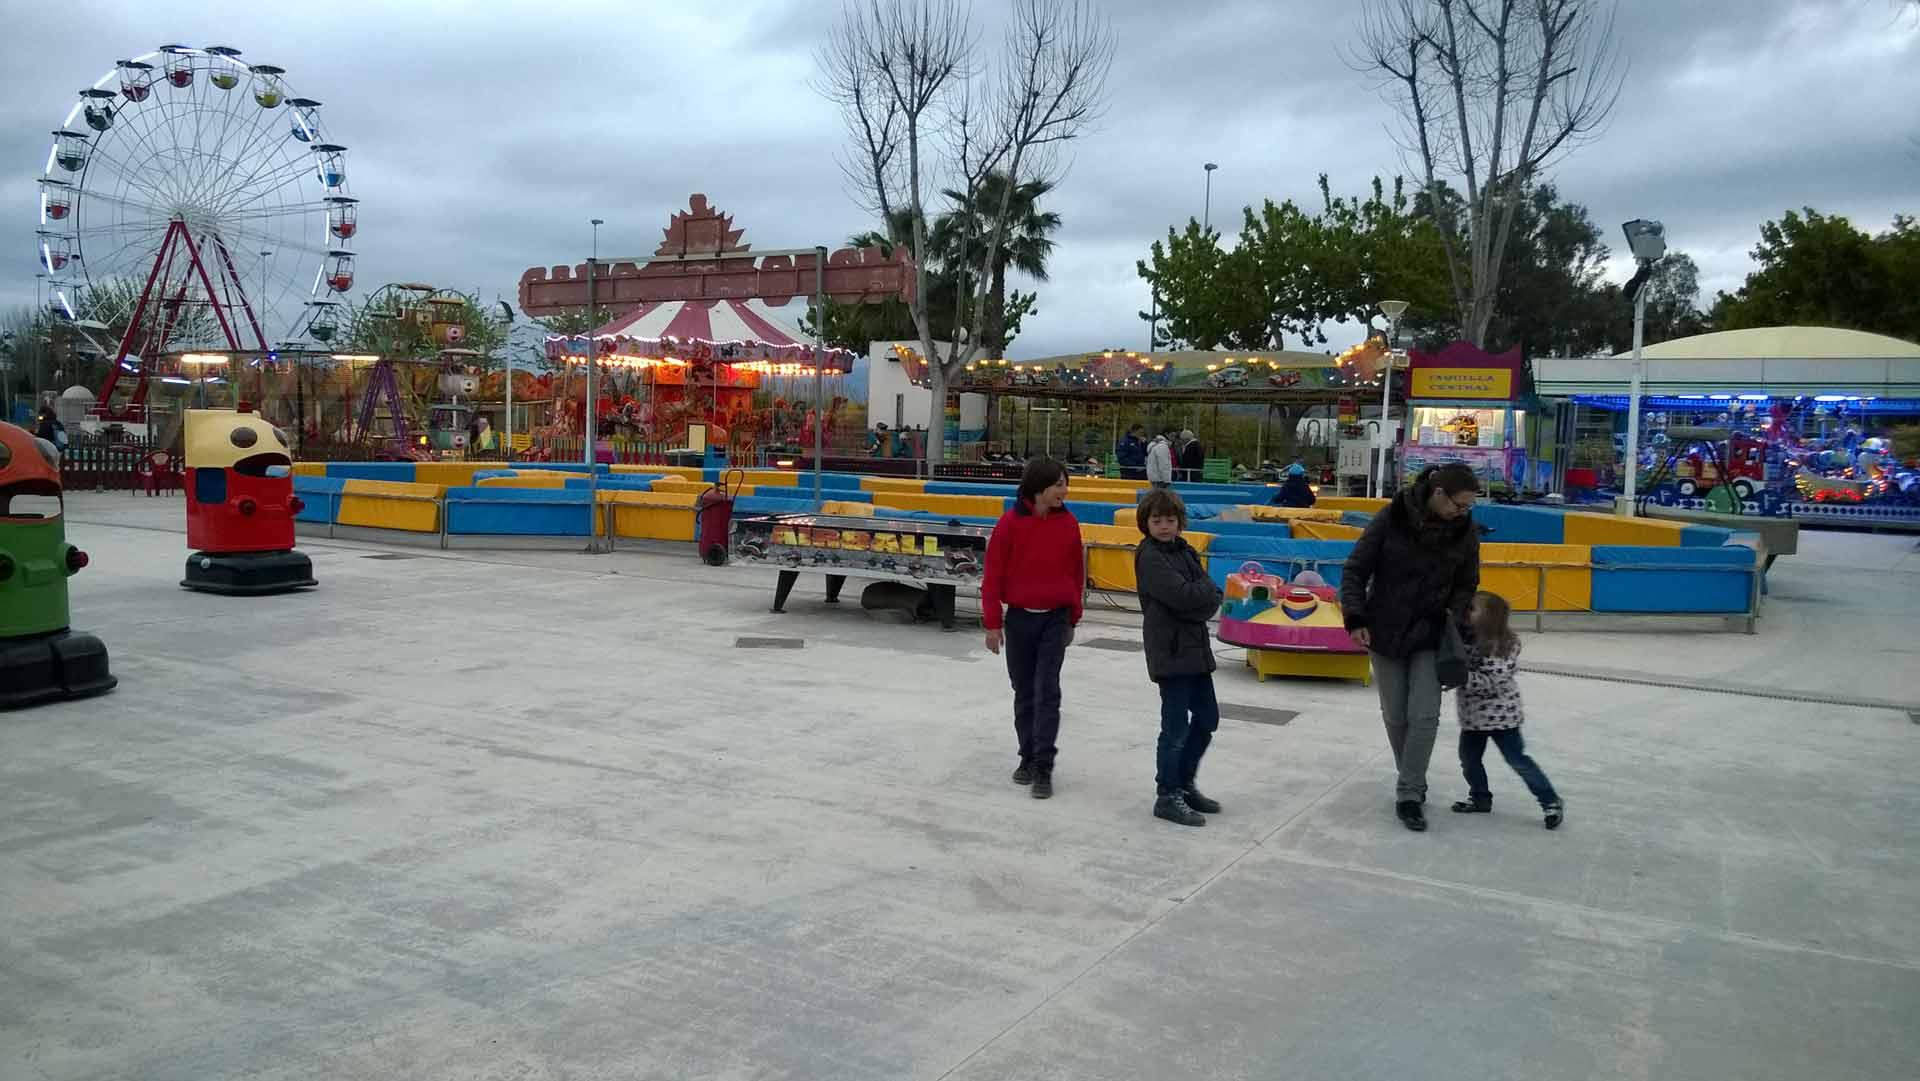 foto parque atracciones Gandilandia gandia